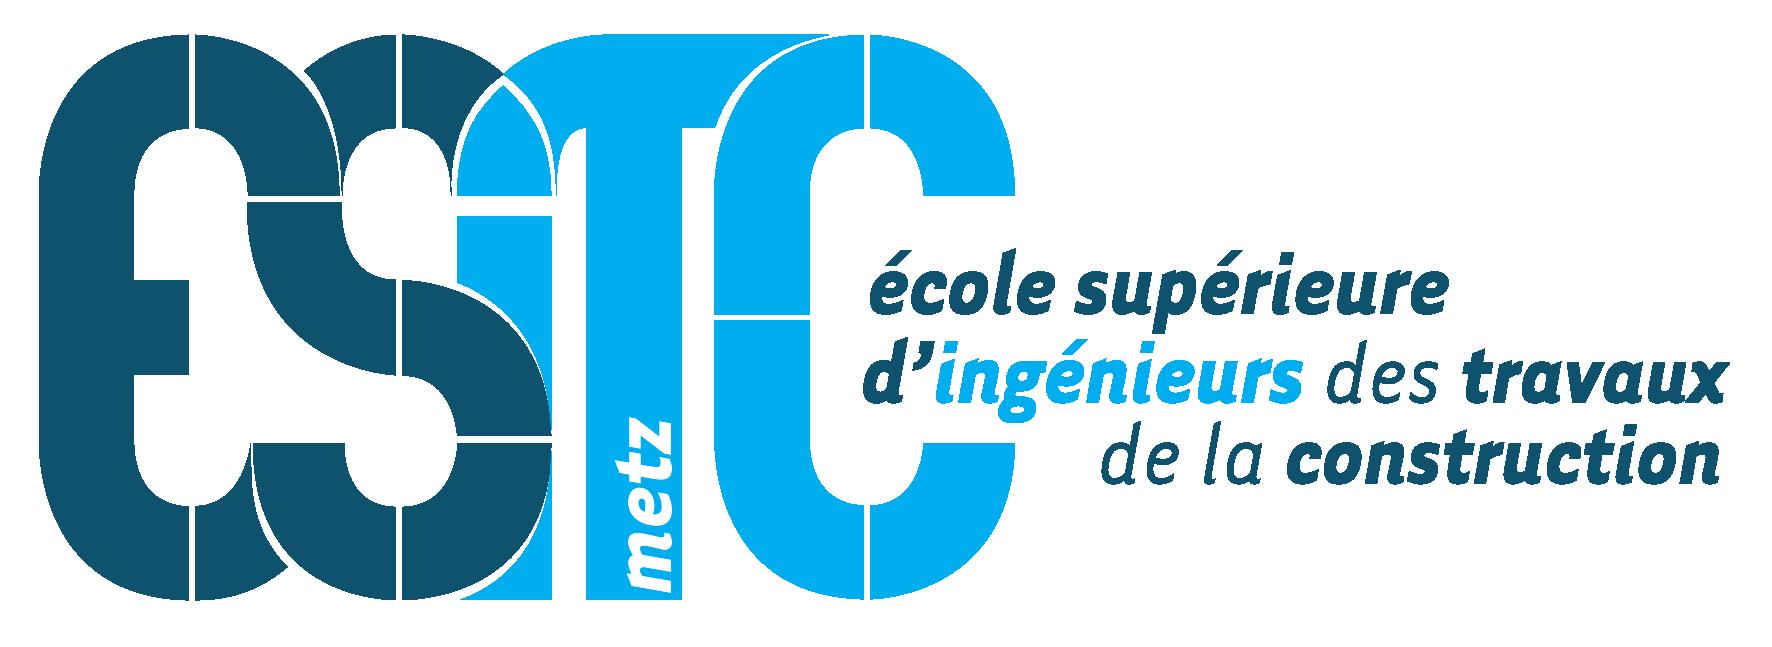 Forum ESITC Metz